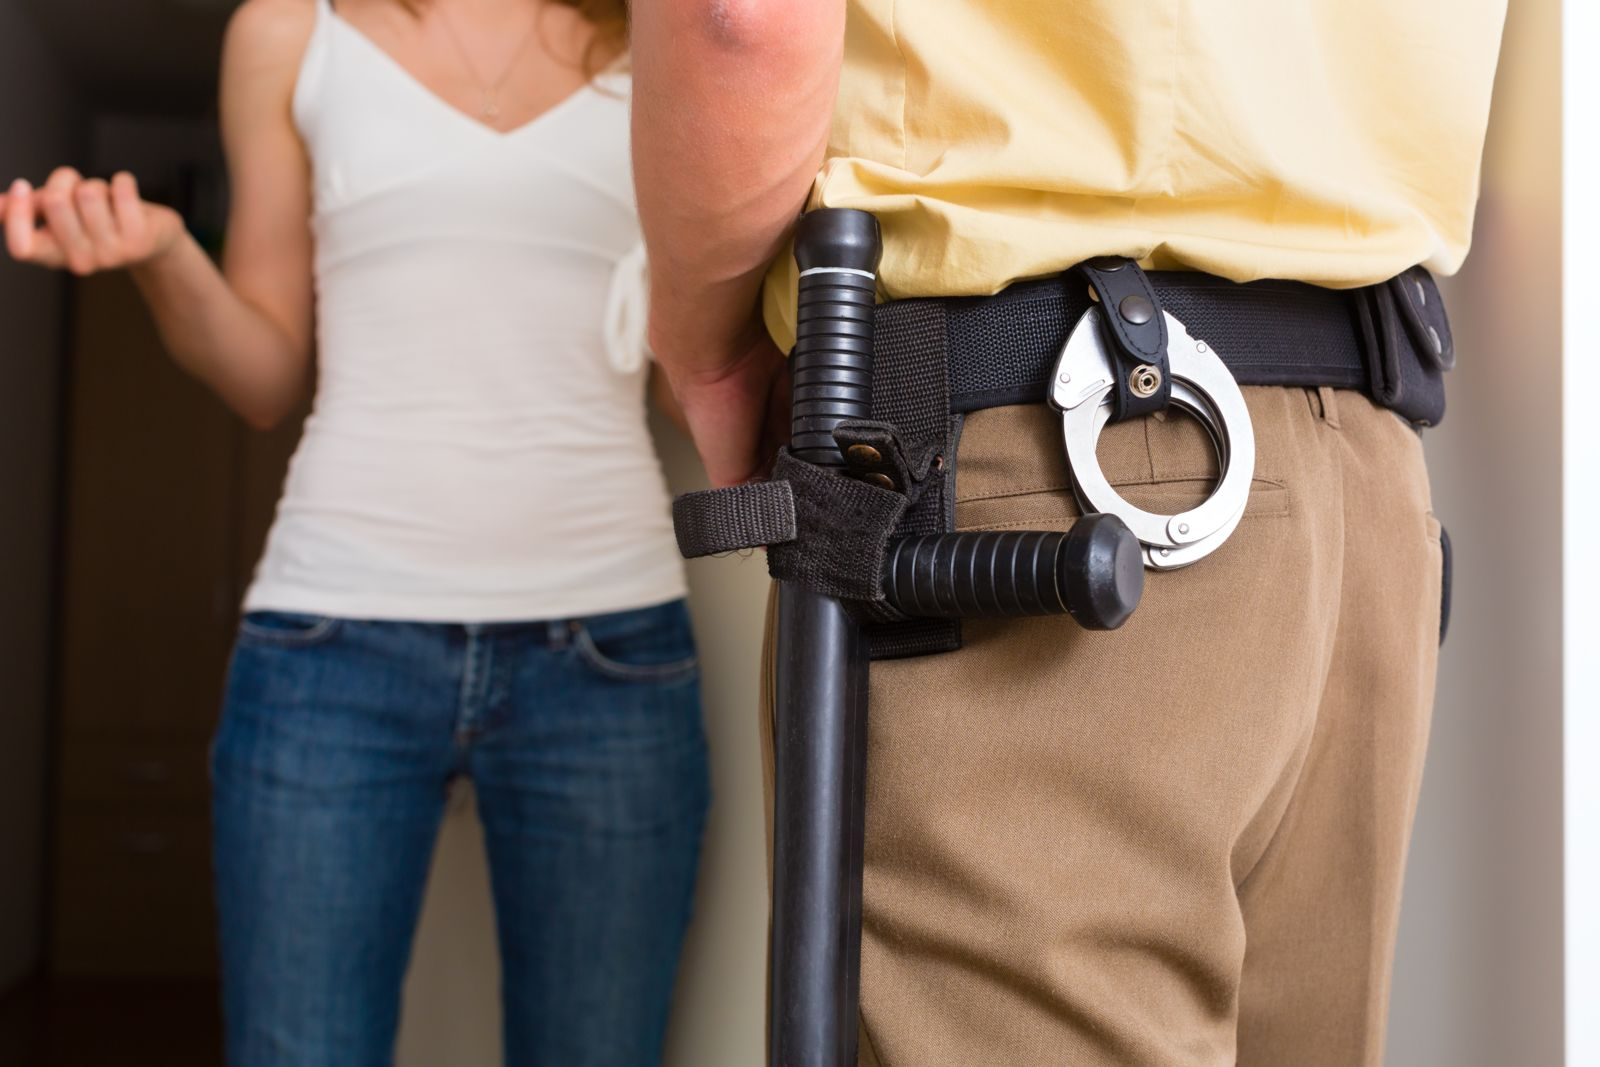 police search warrant